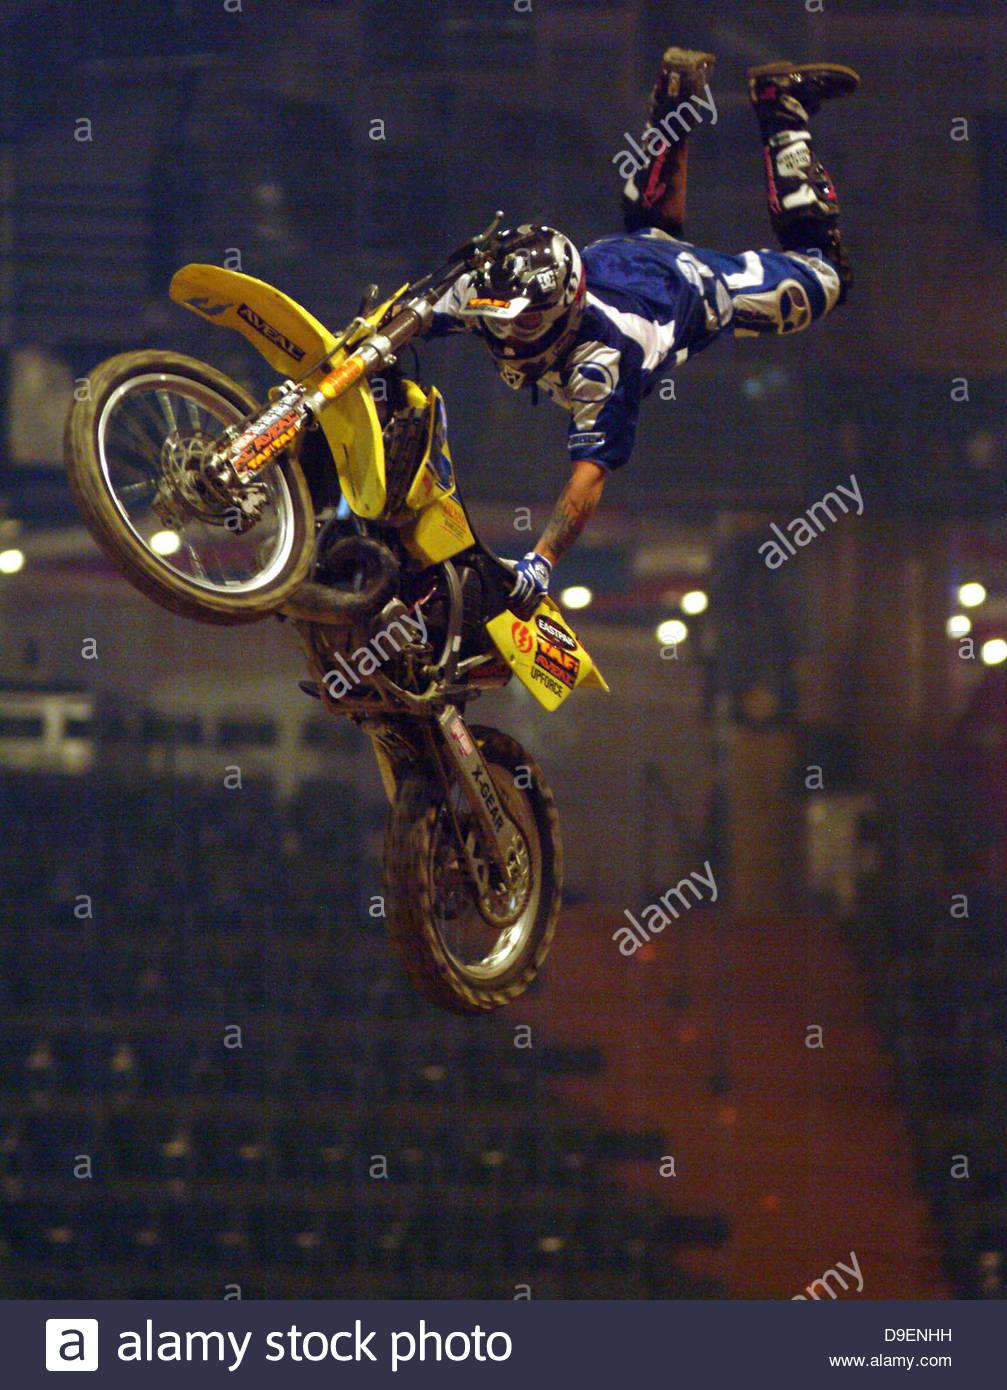 action adult bike crash helmet daredevil display exciting jumping jumps leaped leaps male man midair motorbike motorcycle - Stock Image